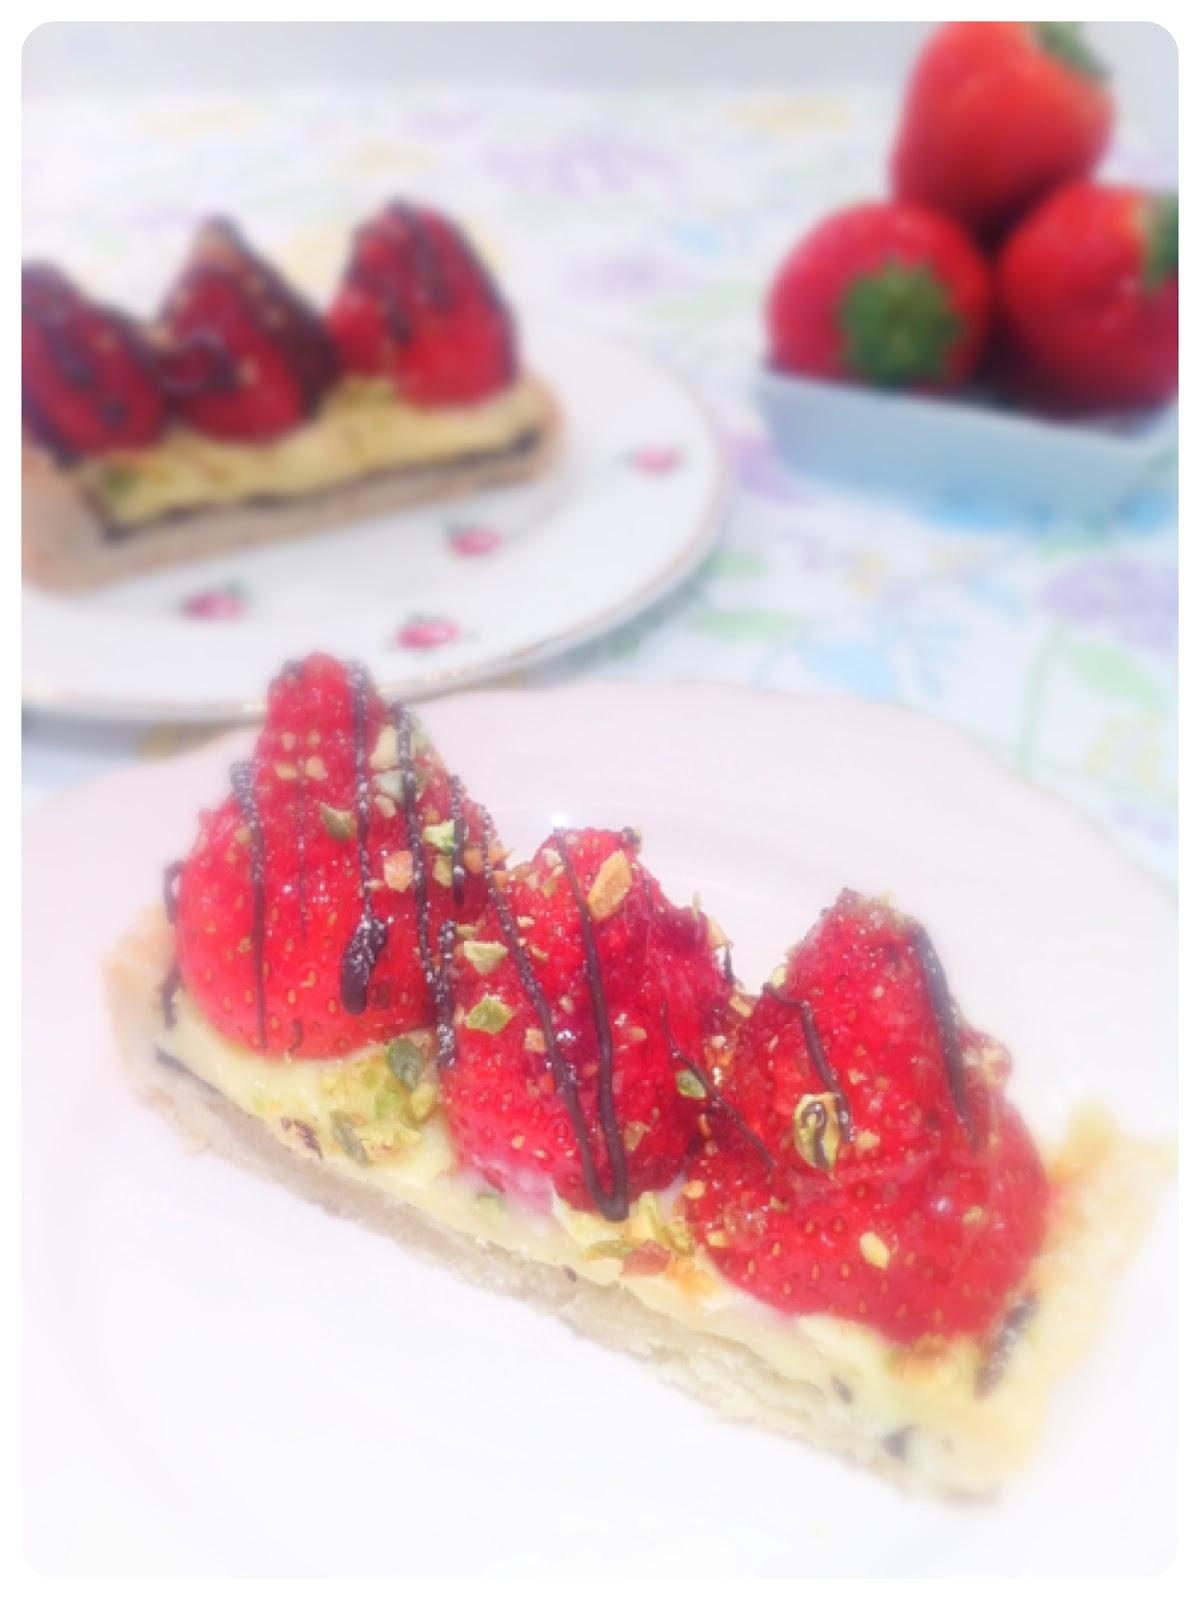 Strawberry Tart | Chérie Kelly